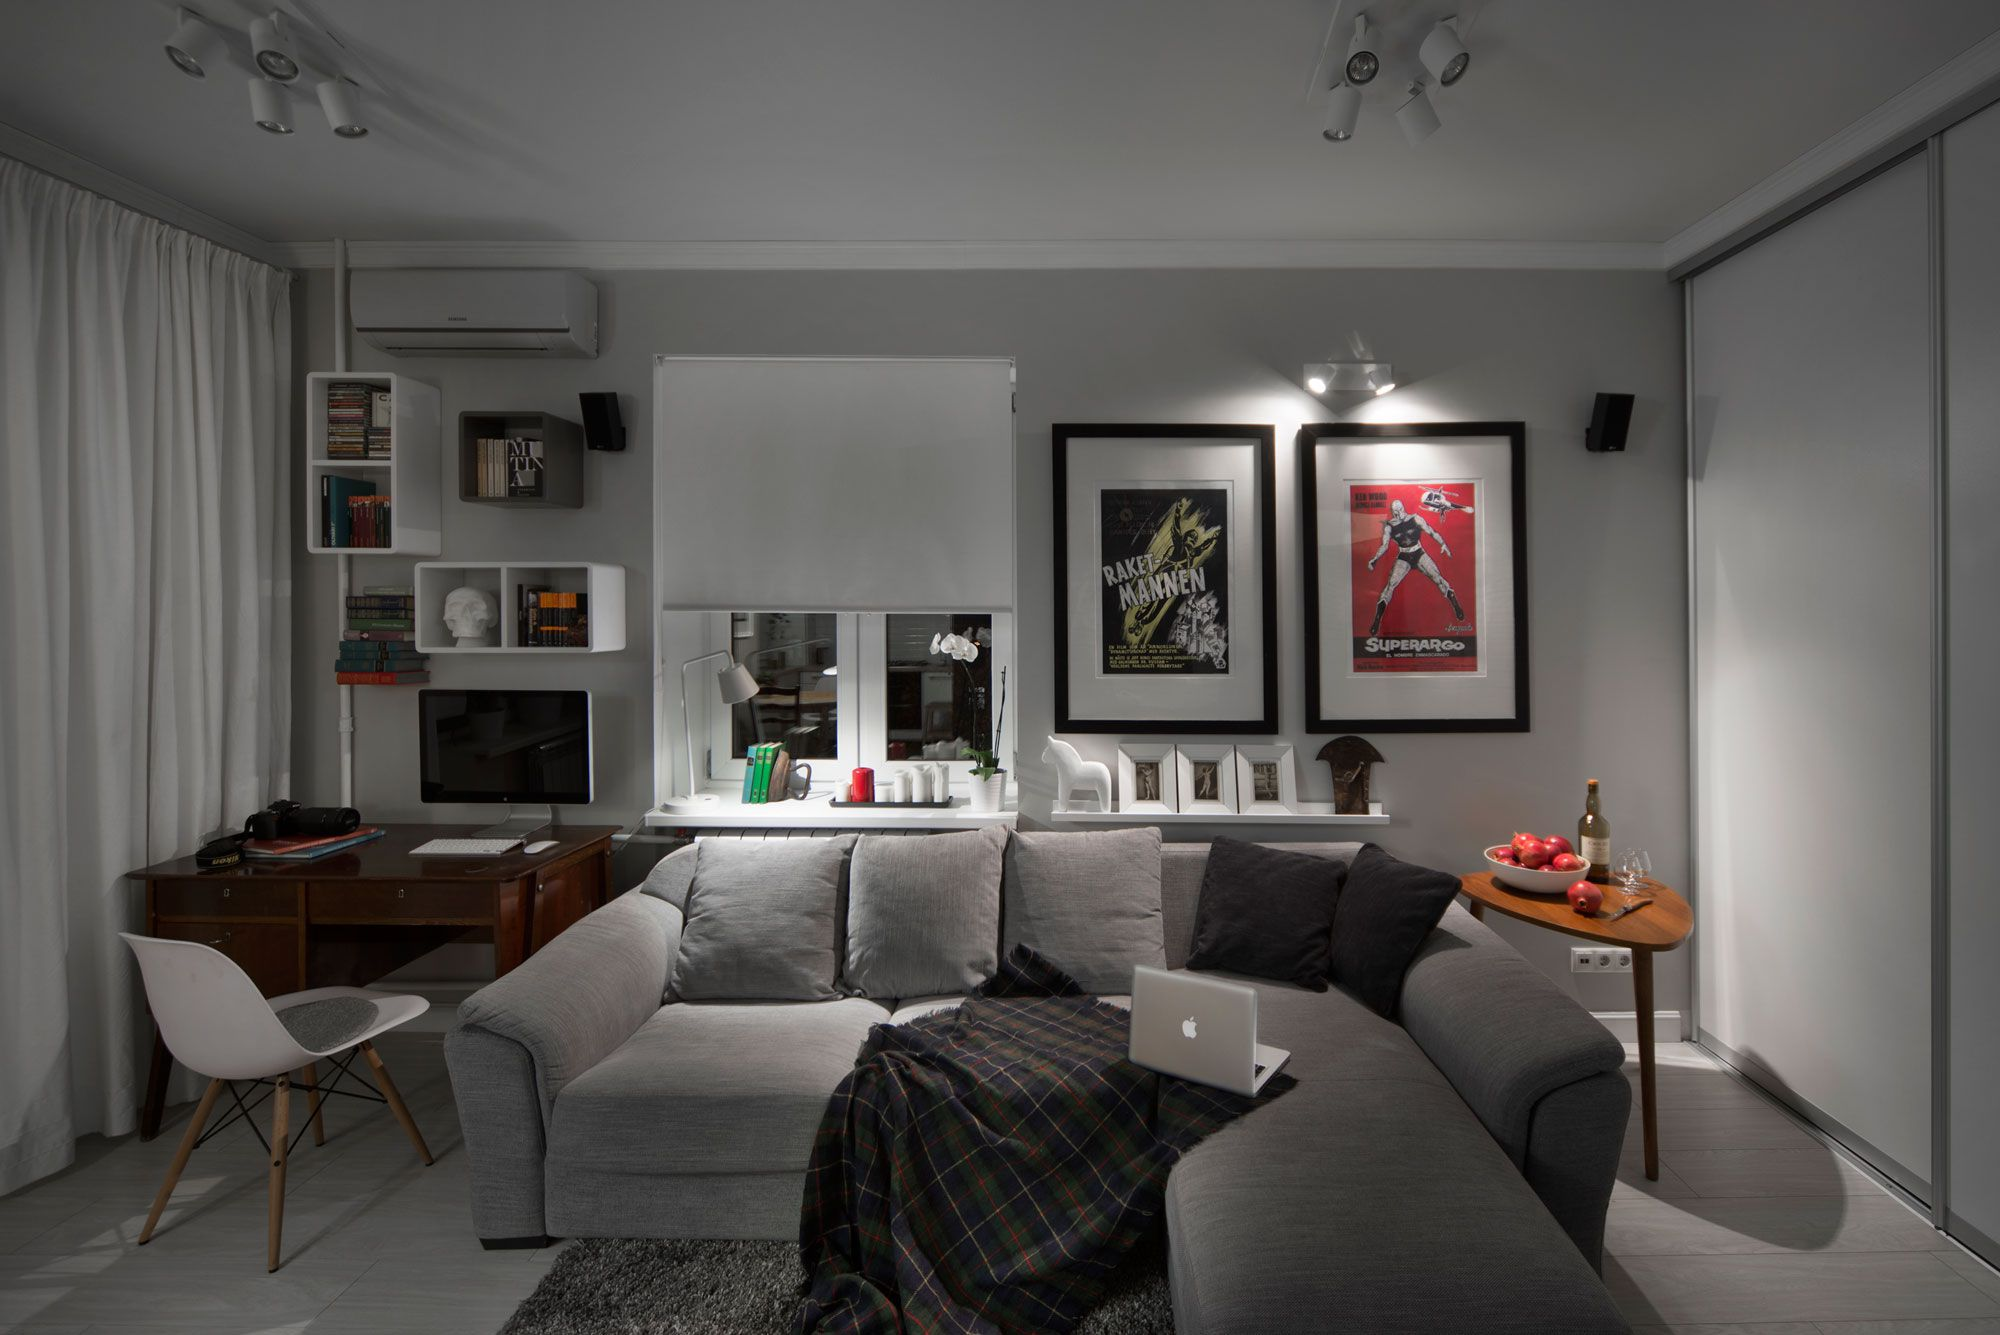 Фото интерьер 1-комнатной хрущевки